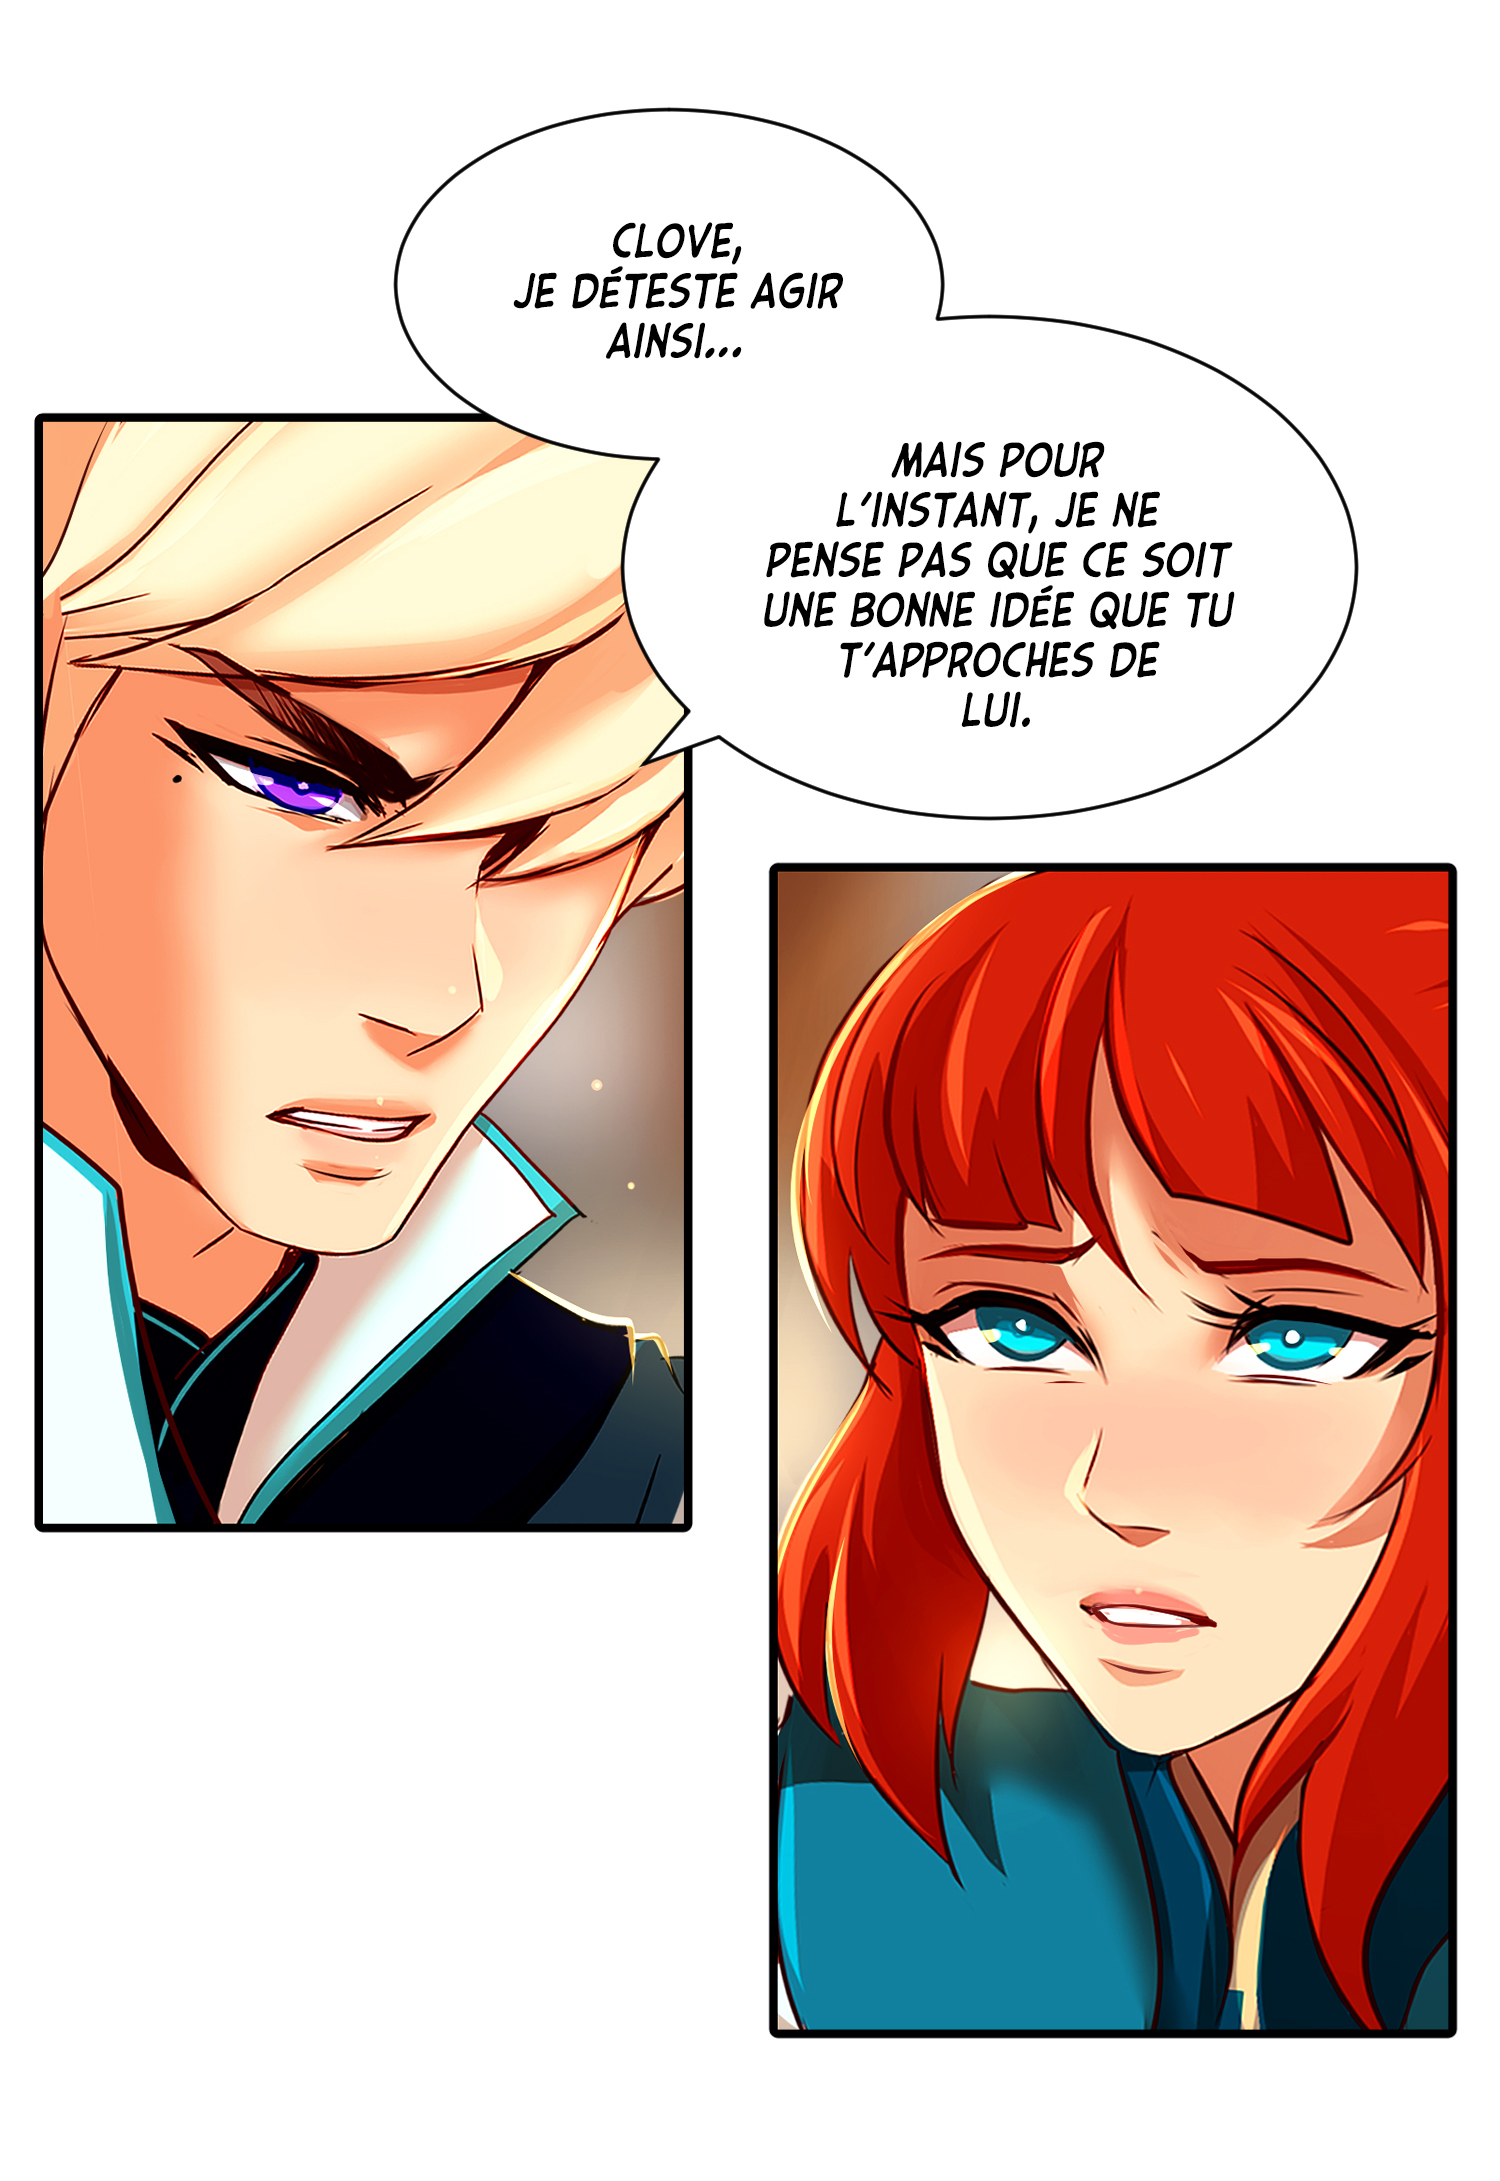 Webtoon Subzero en français (traduction : Sarah Kourouma ; lettrage : Bryan Wetstein)